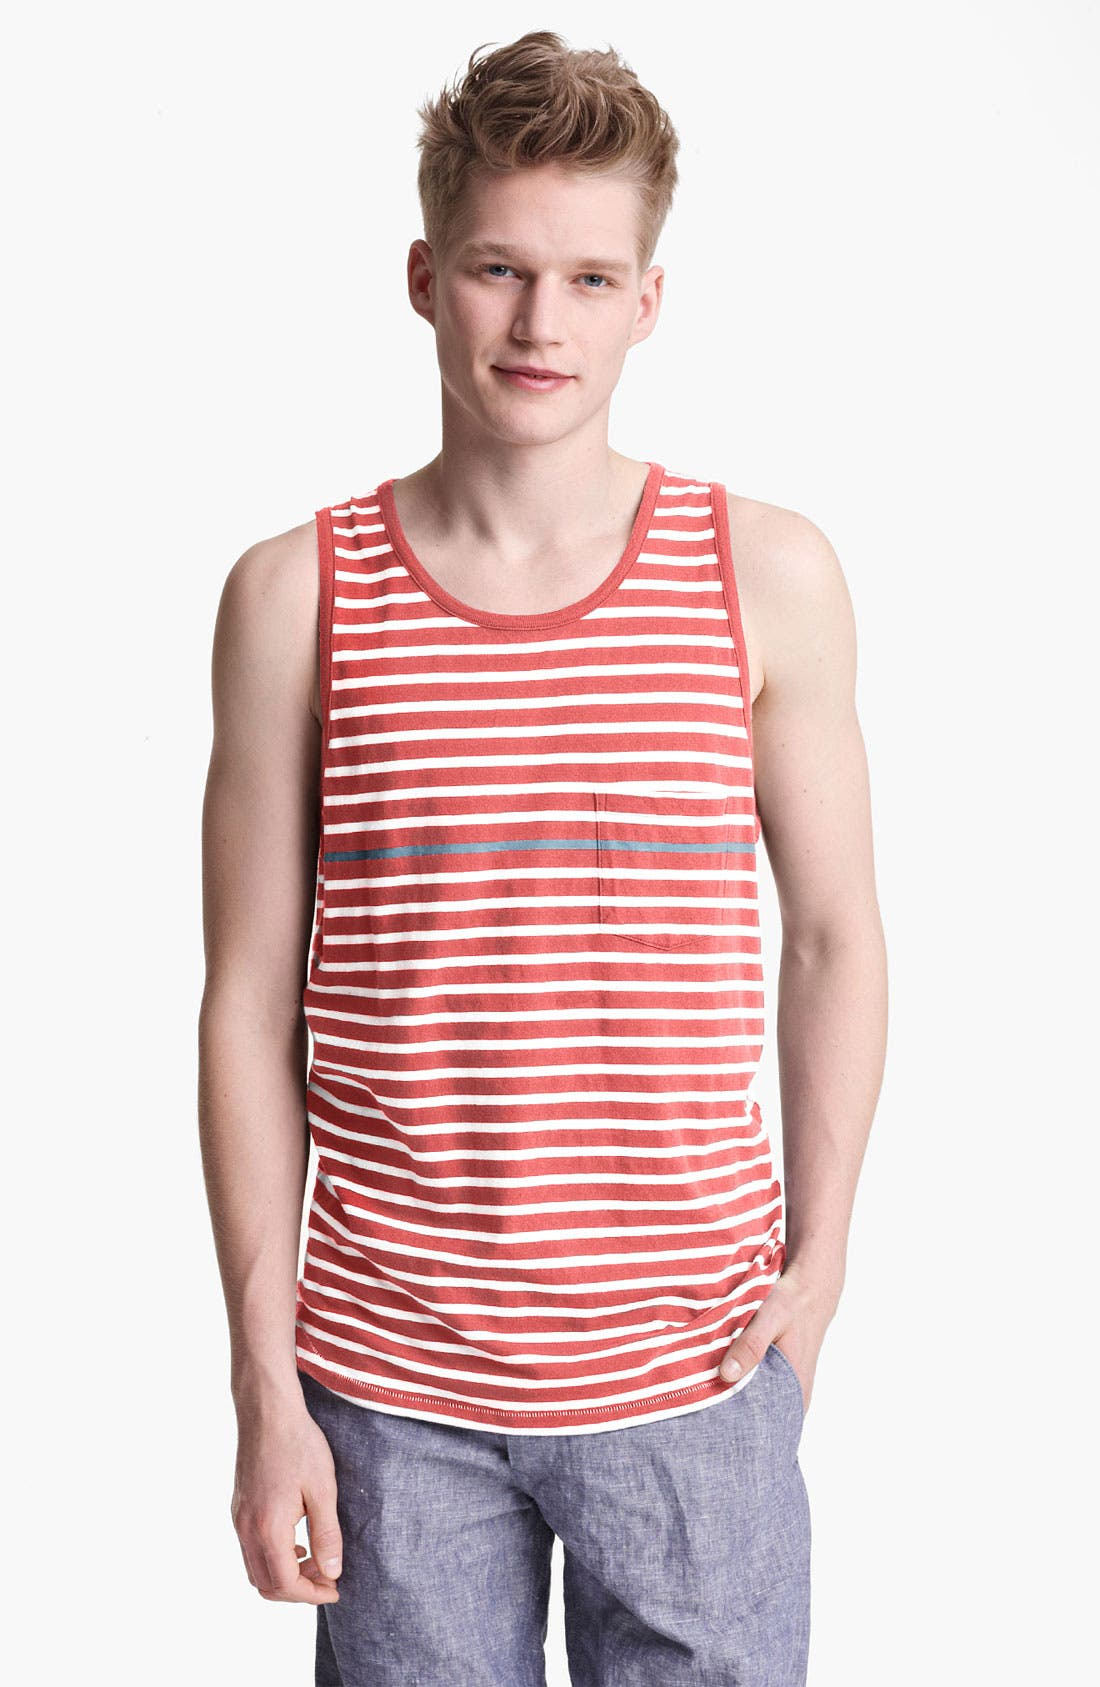 Main Image - rag & bone 'Perfect Stripe' Tank Top